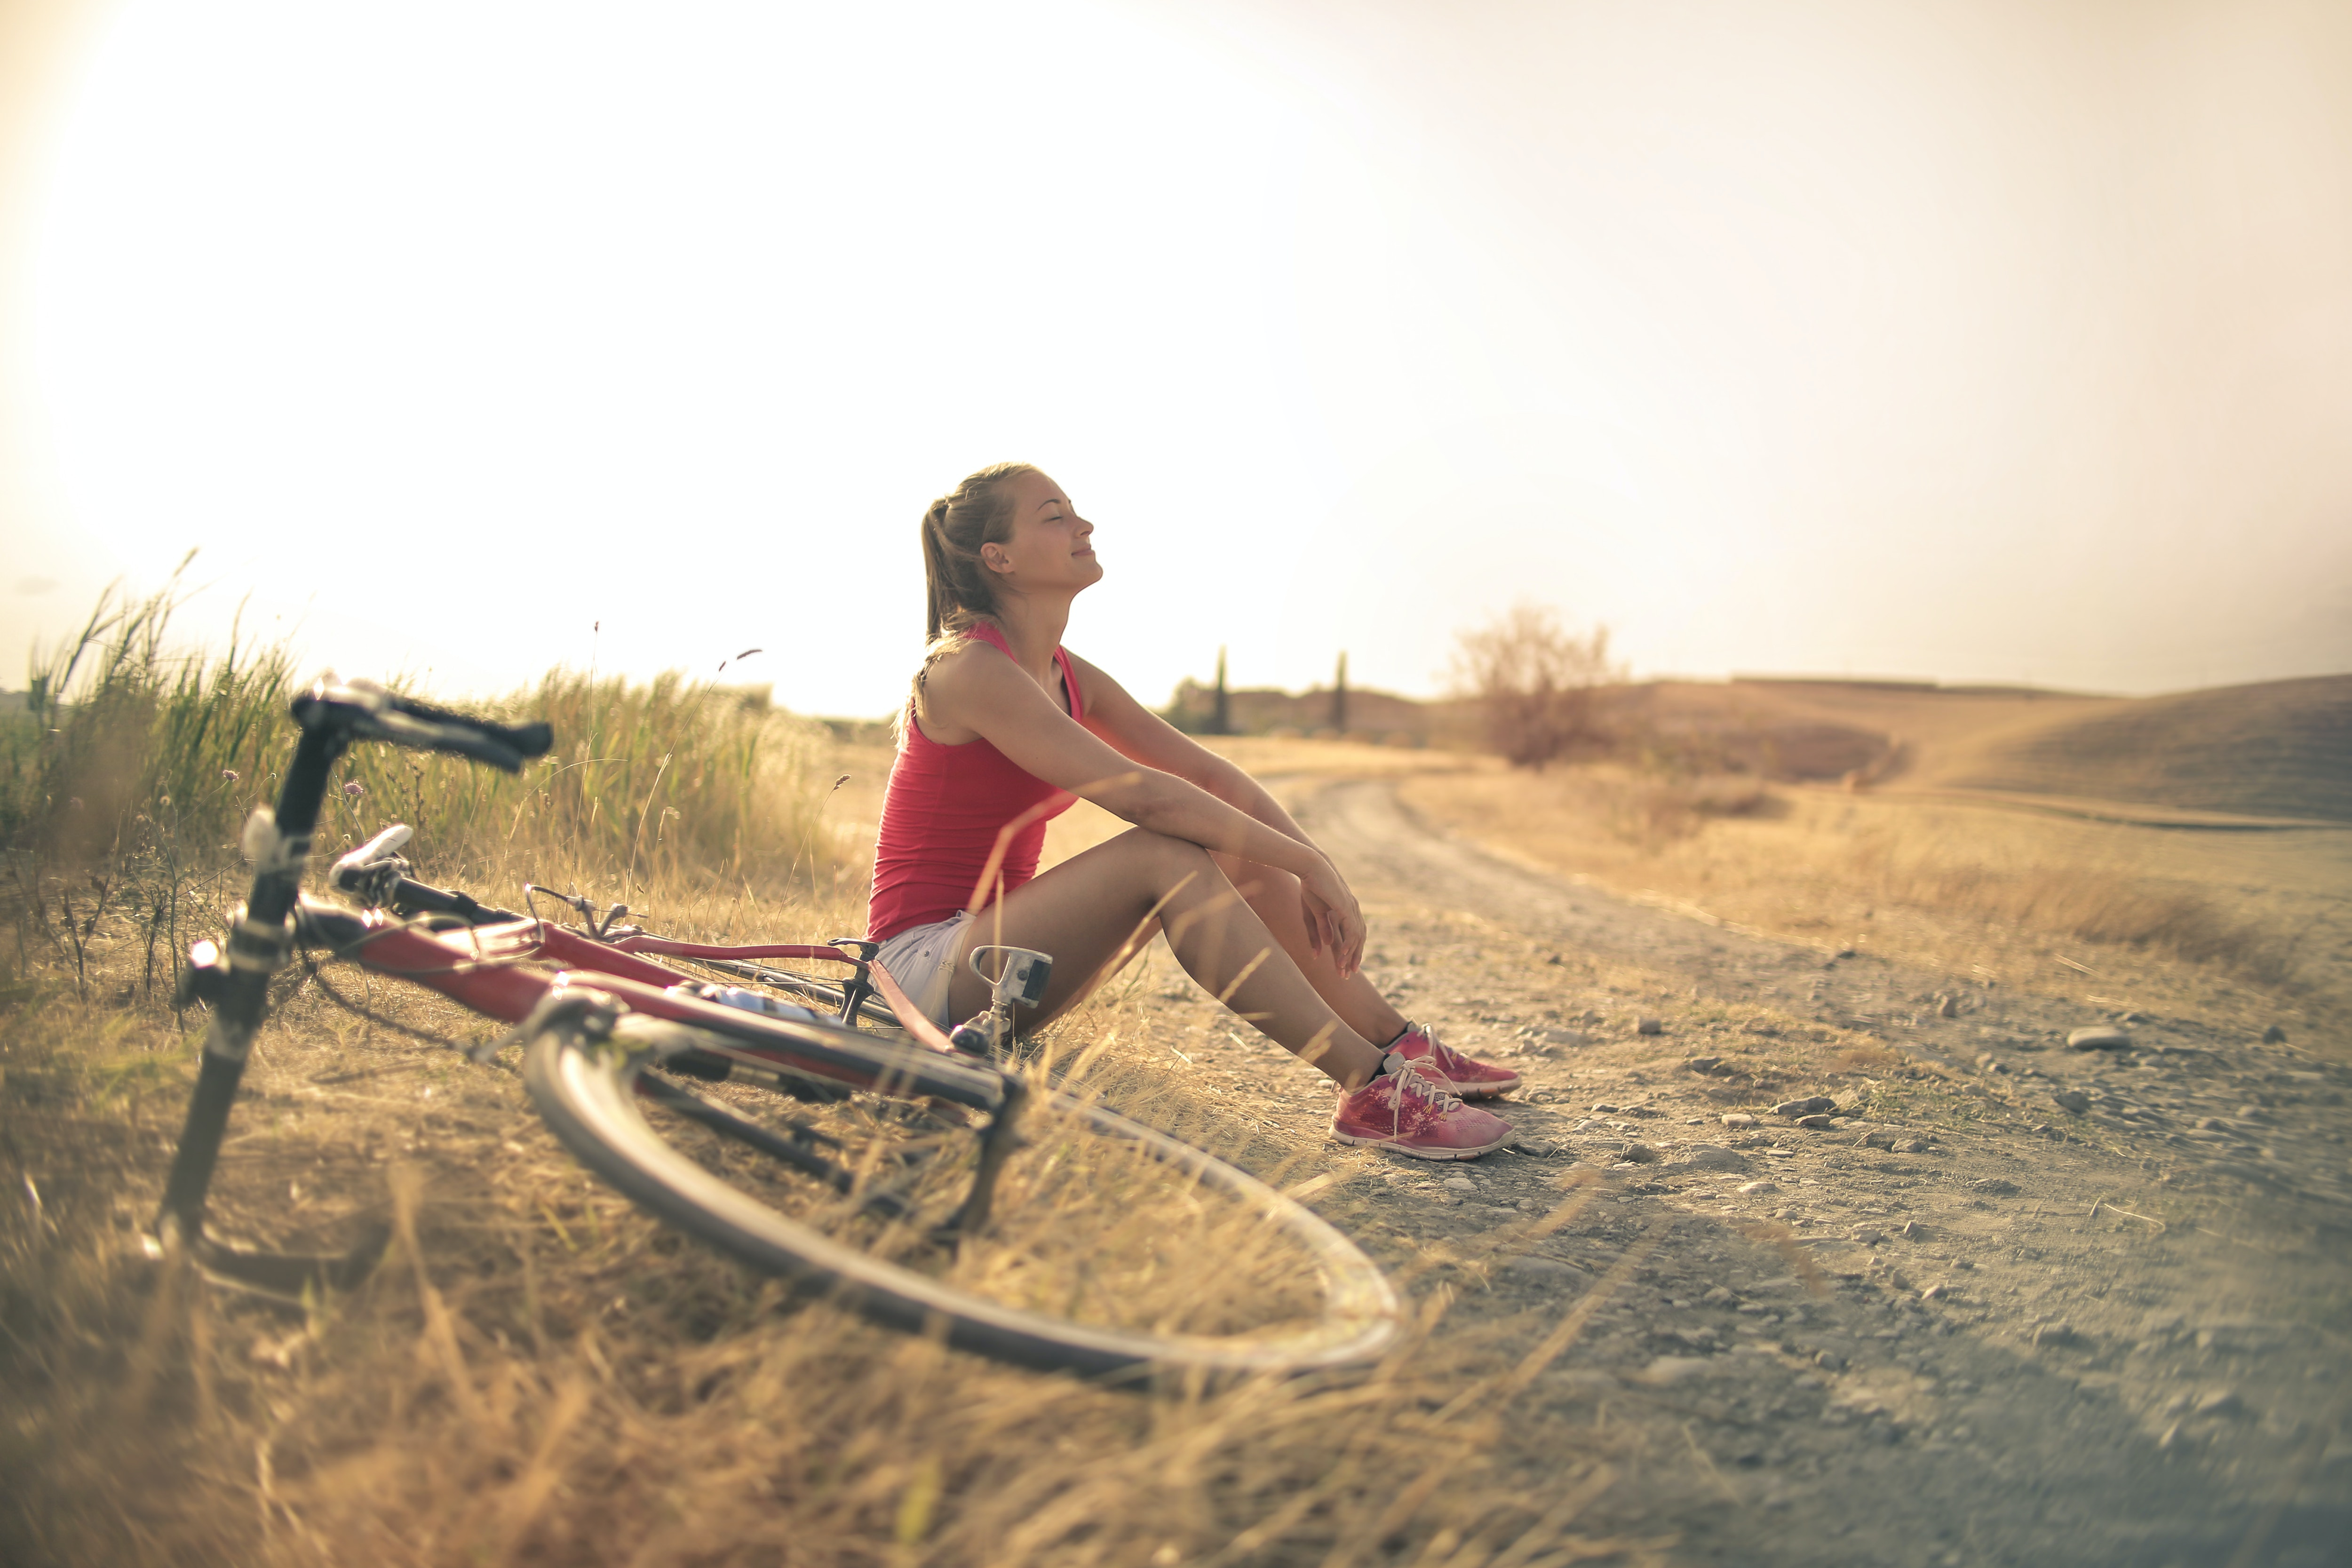 Cyklistika krajinou rybníků i krásami Šumavy